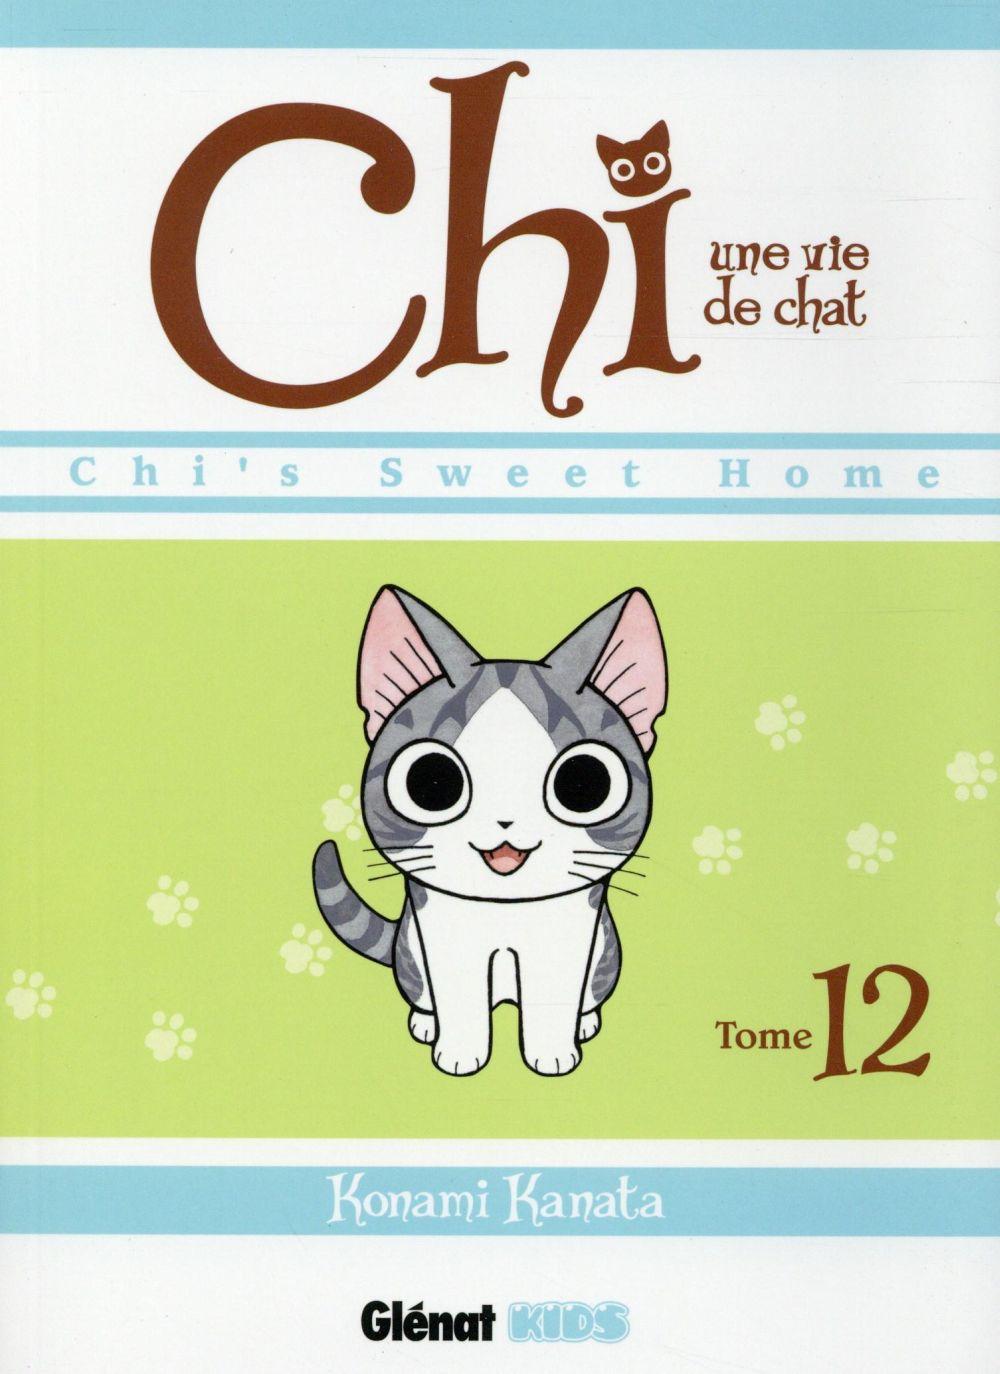 CHI - UNE VIE DE CHAT - TOME 12 KANATA KONAMI Glénat